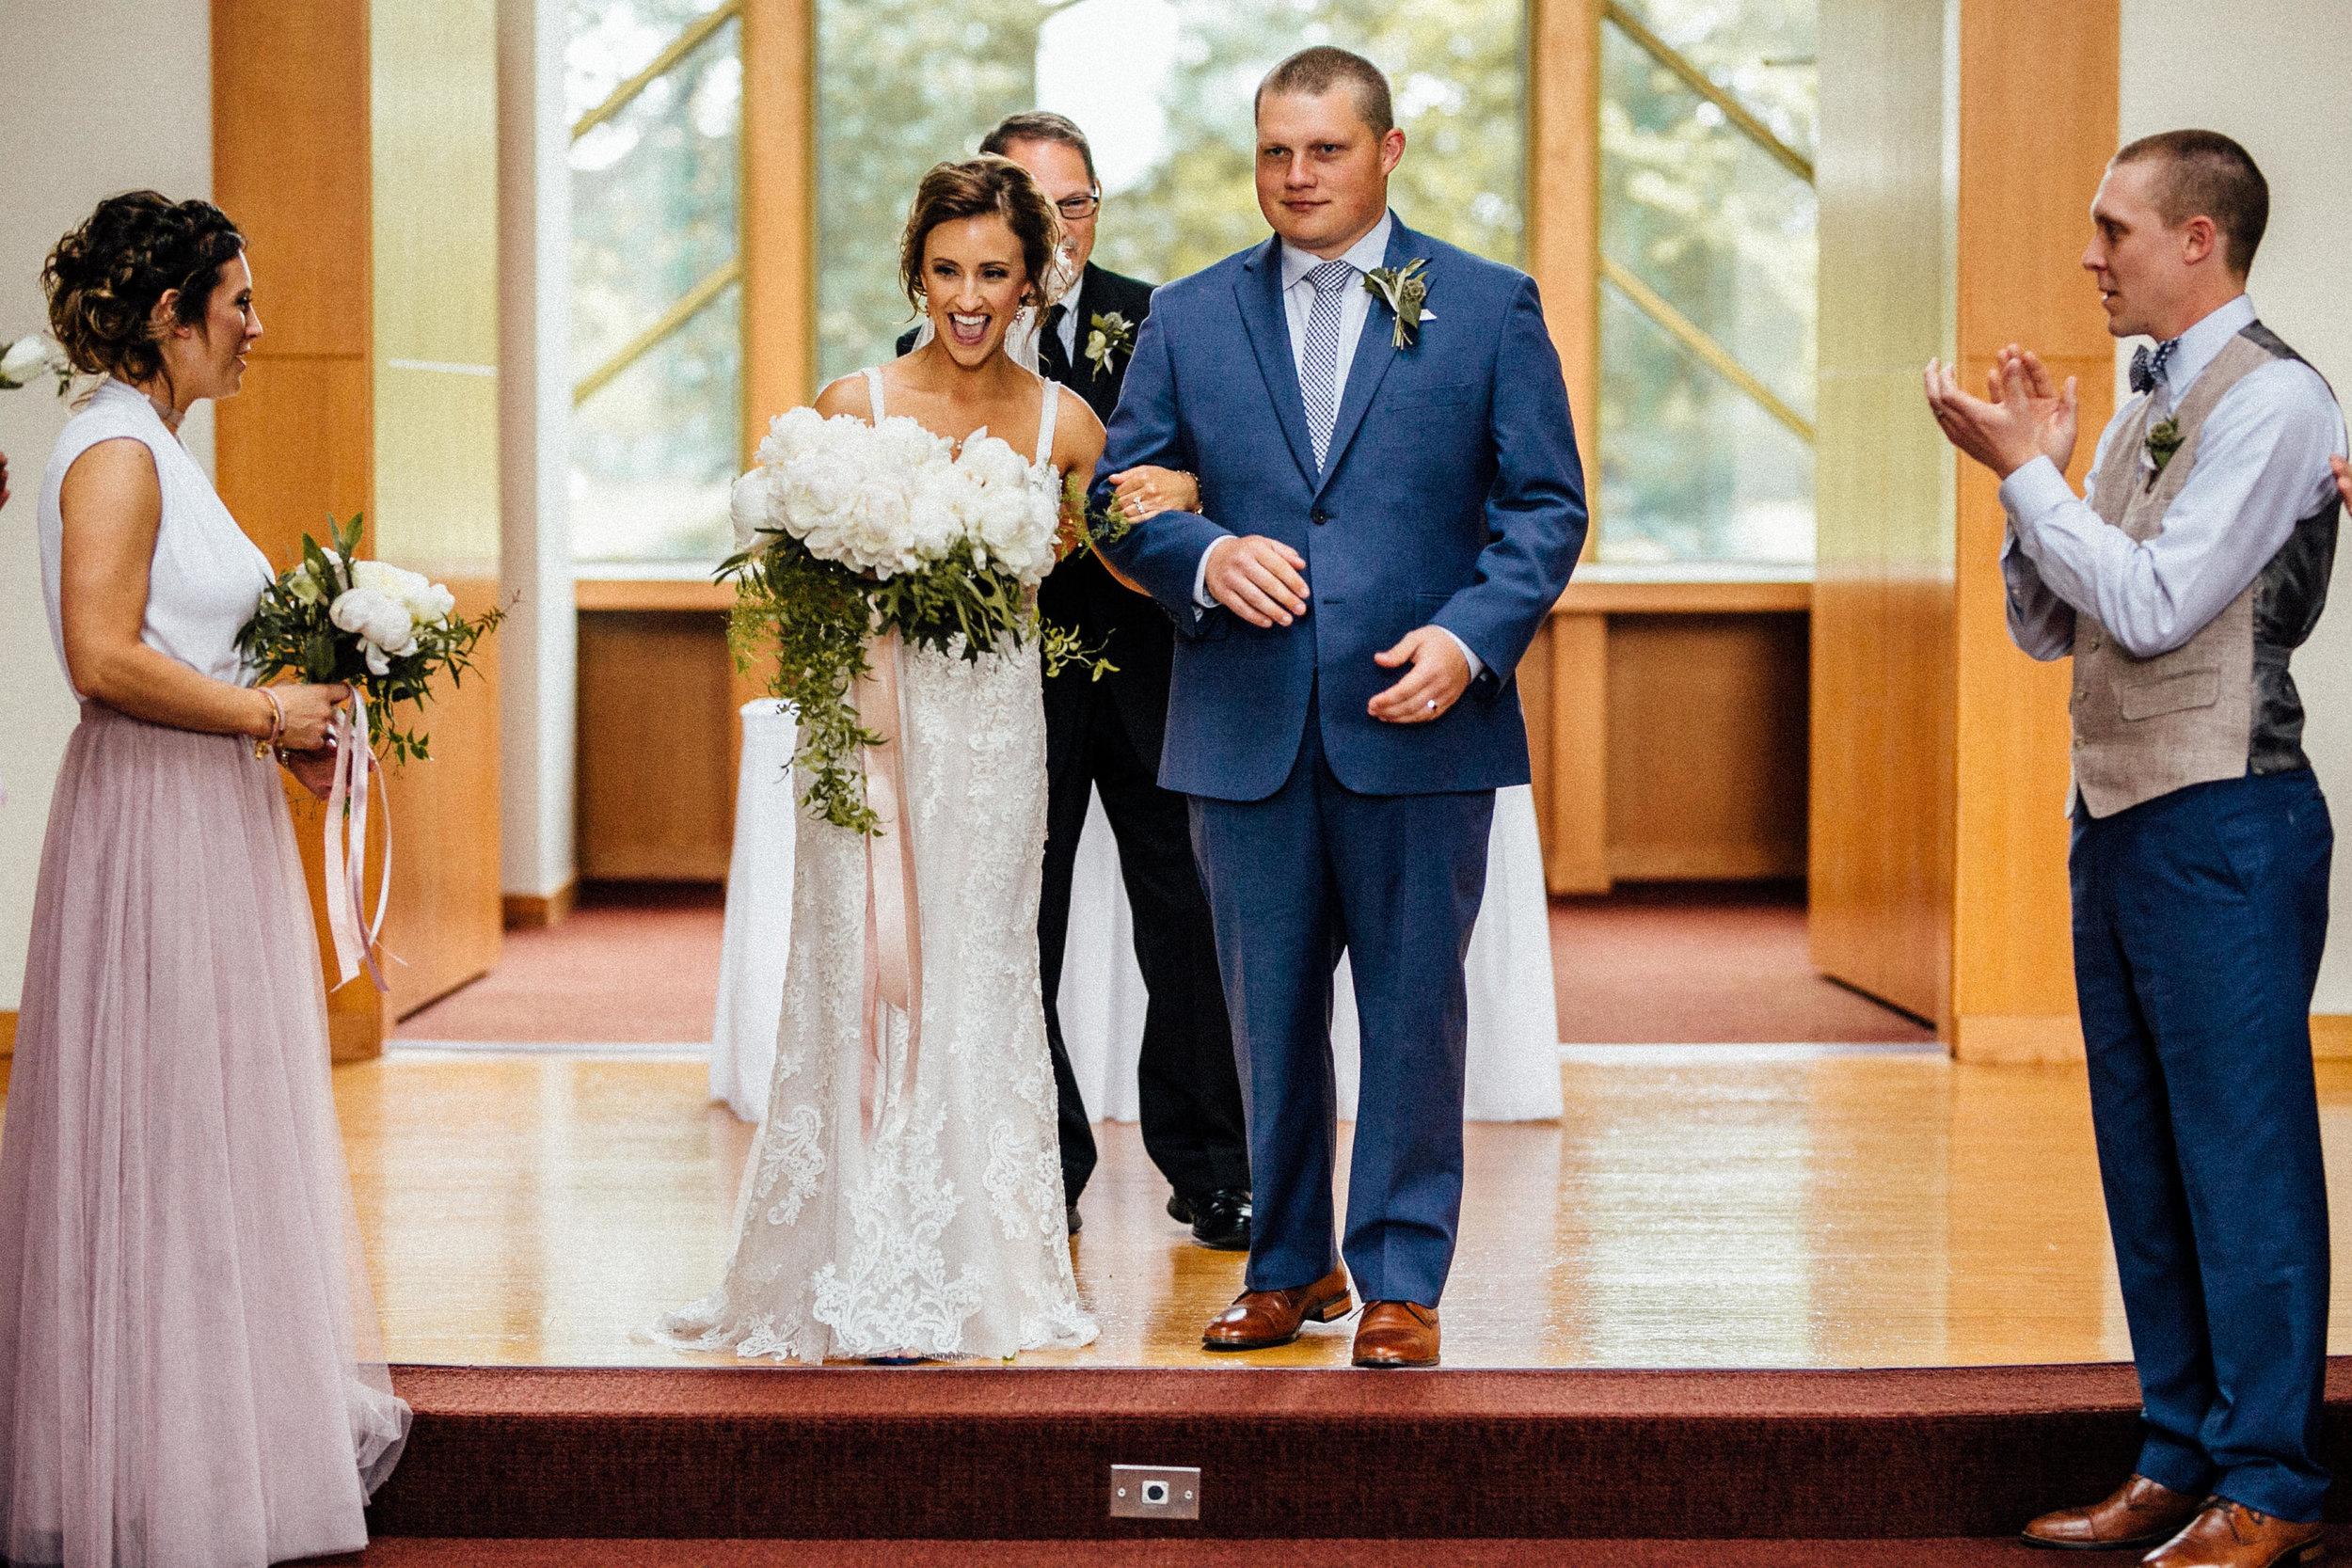 Whitney-Kevin-Ceremony-Michigan-Wedding-Photographer-78.jpg